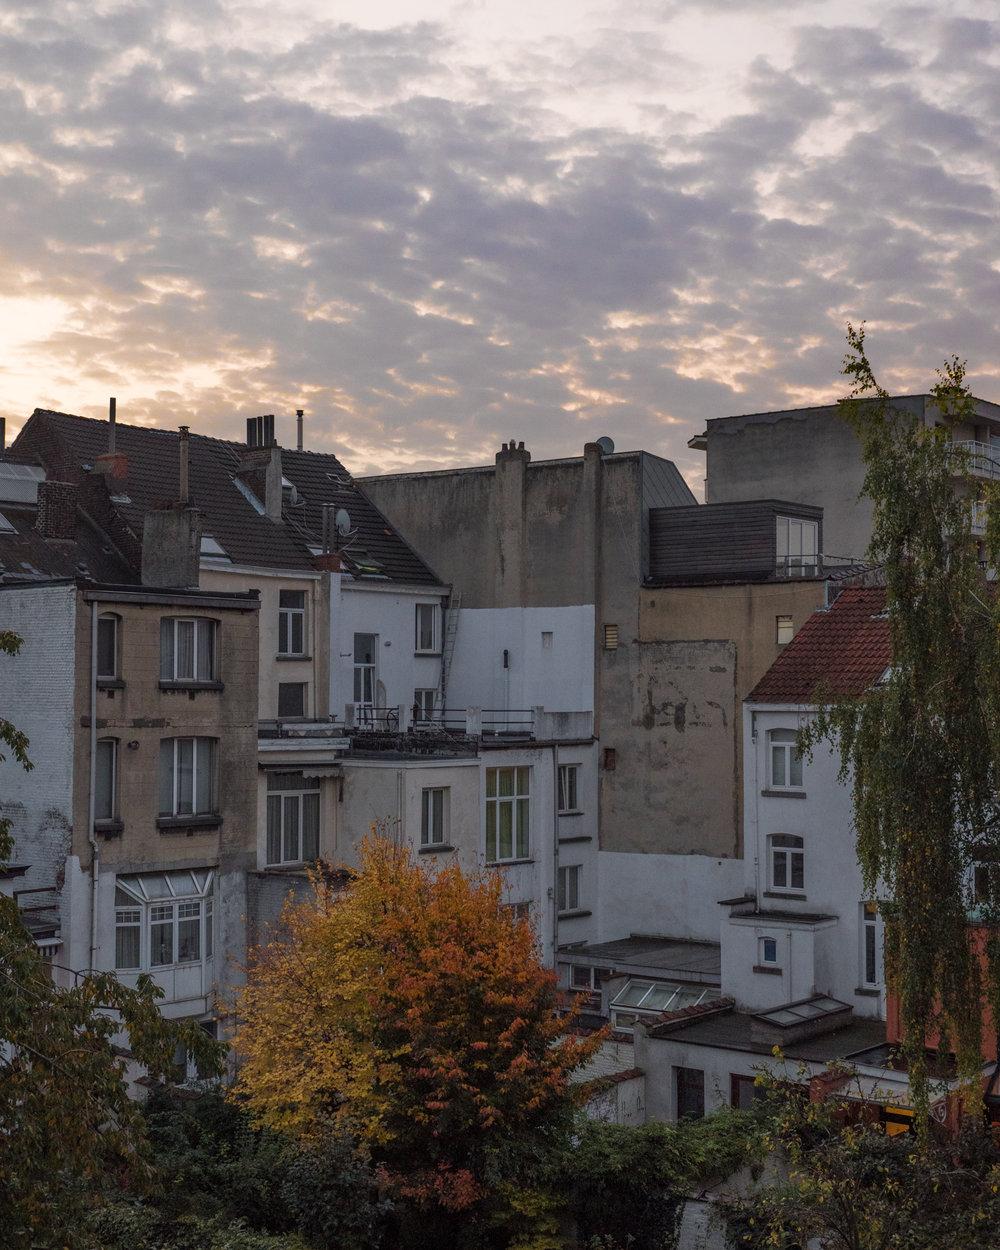 Bruxelles, 2017